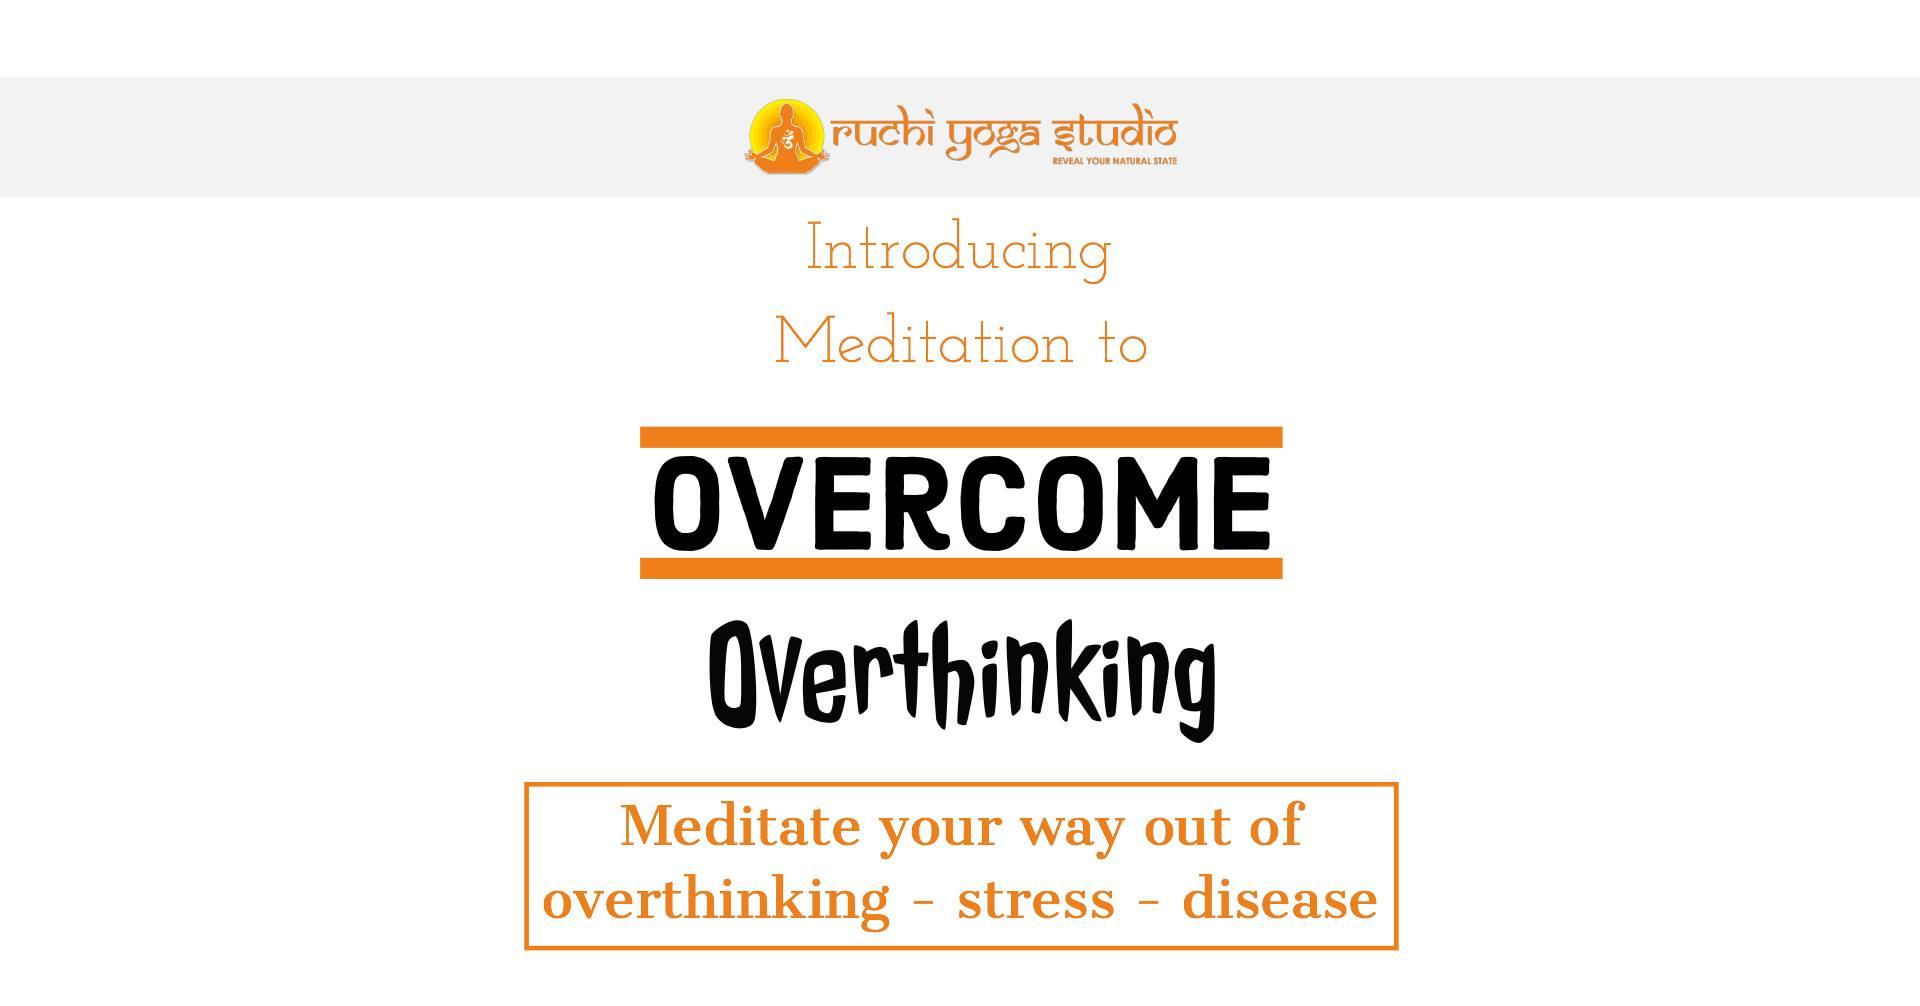 Overcome - Overthinking